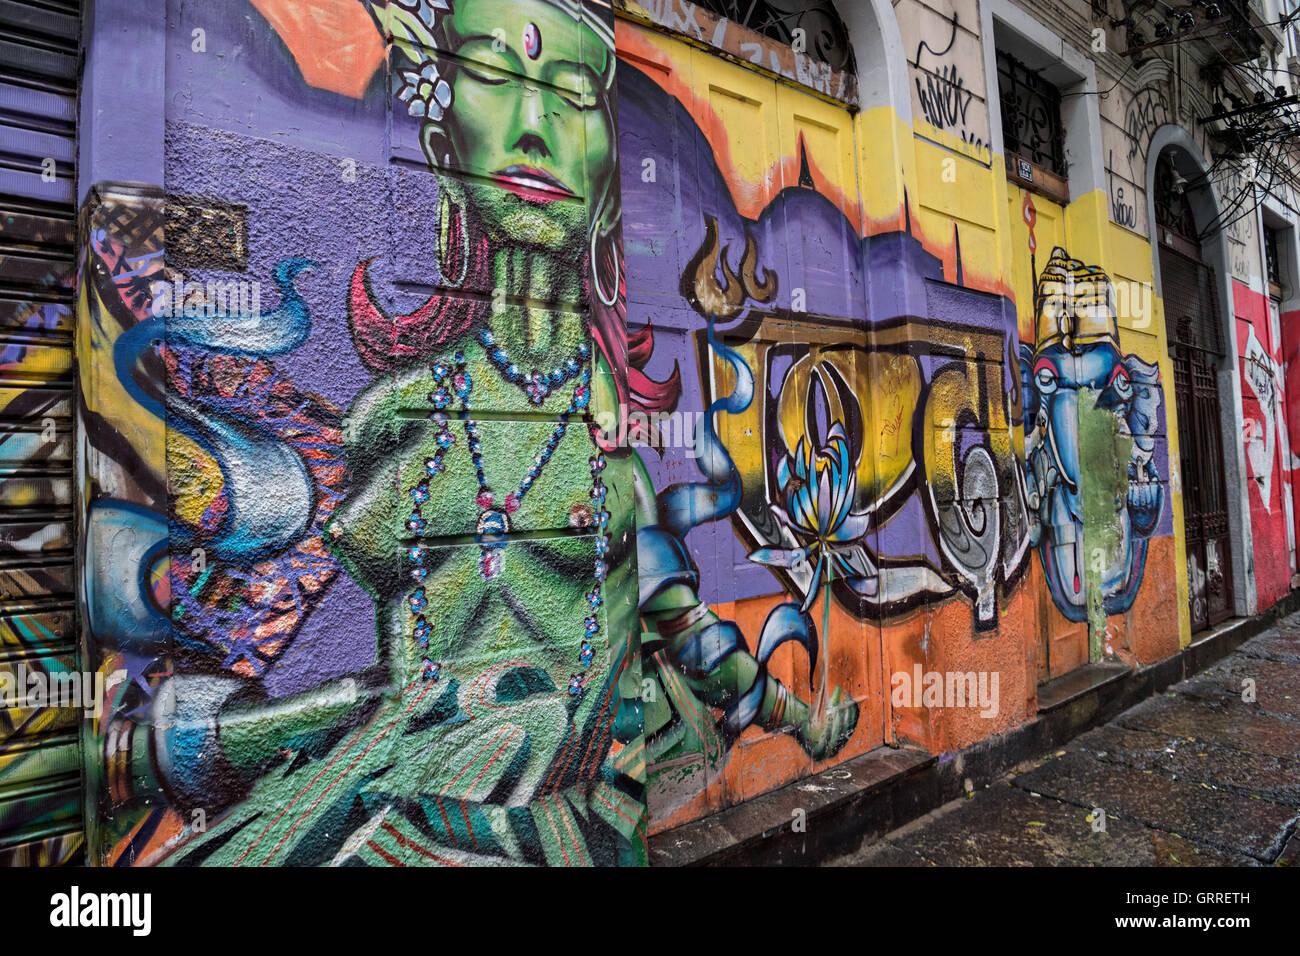 Graffiti wall chelmsford -  Graffiti Art On A Wall In The Lapa Neighborhood In Rio De Janeiro Brazil